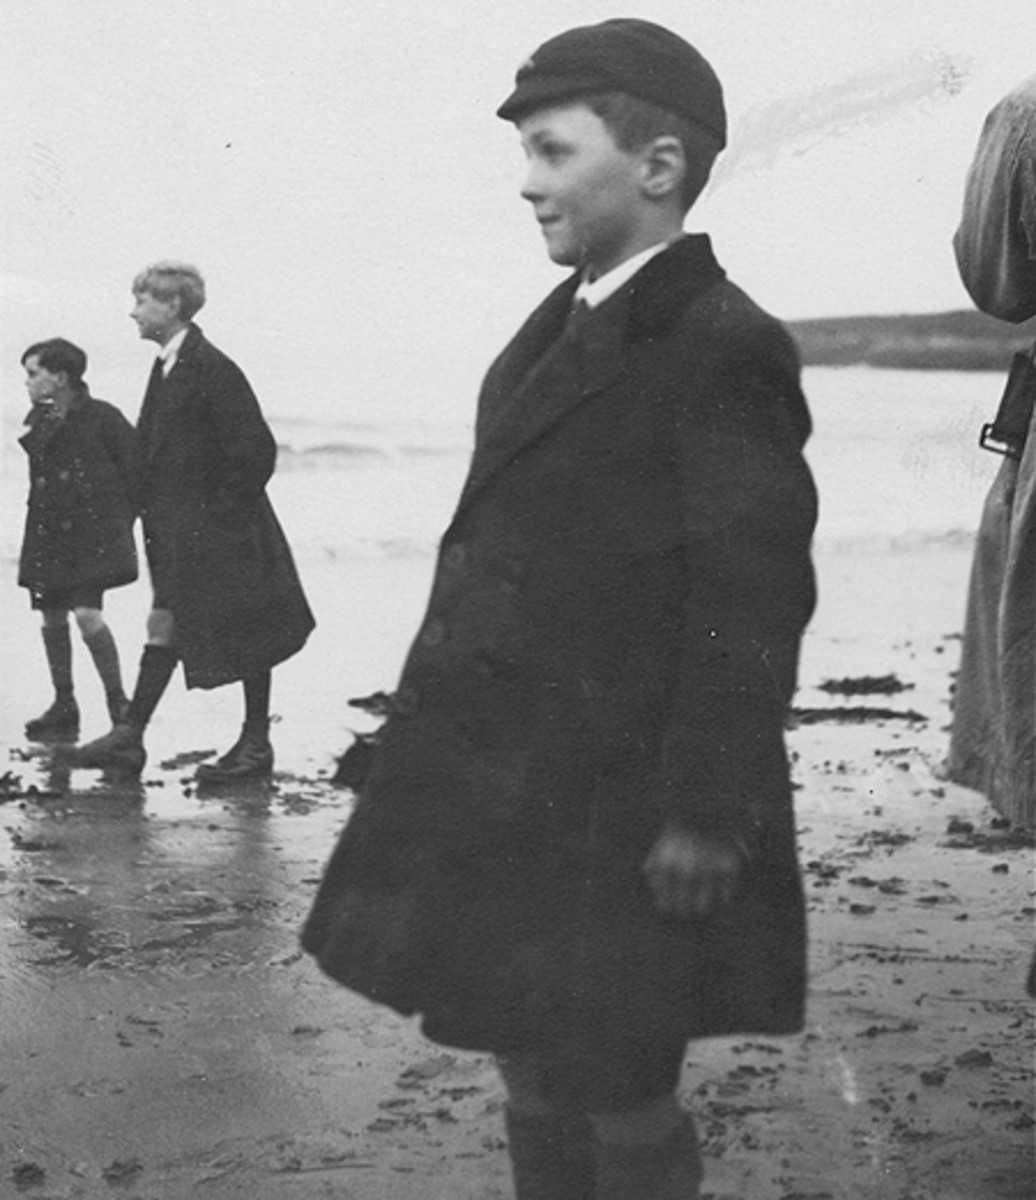 Roald Dahl at boarding school